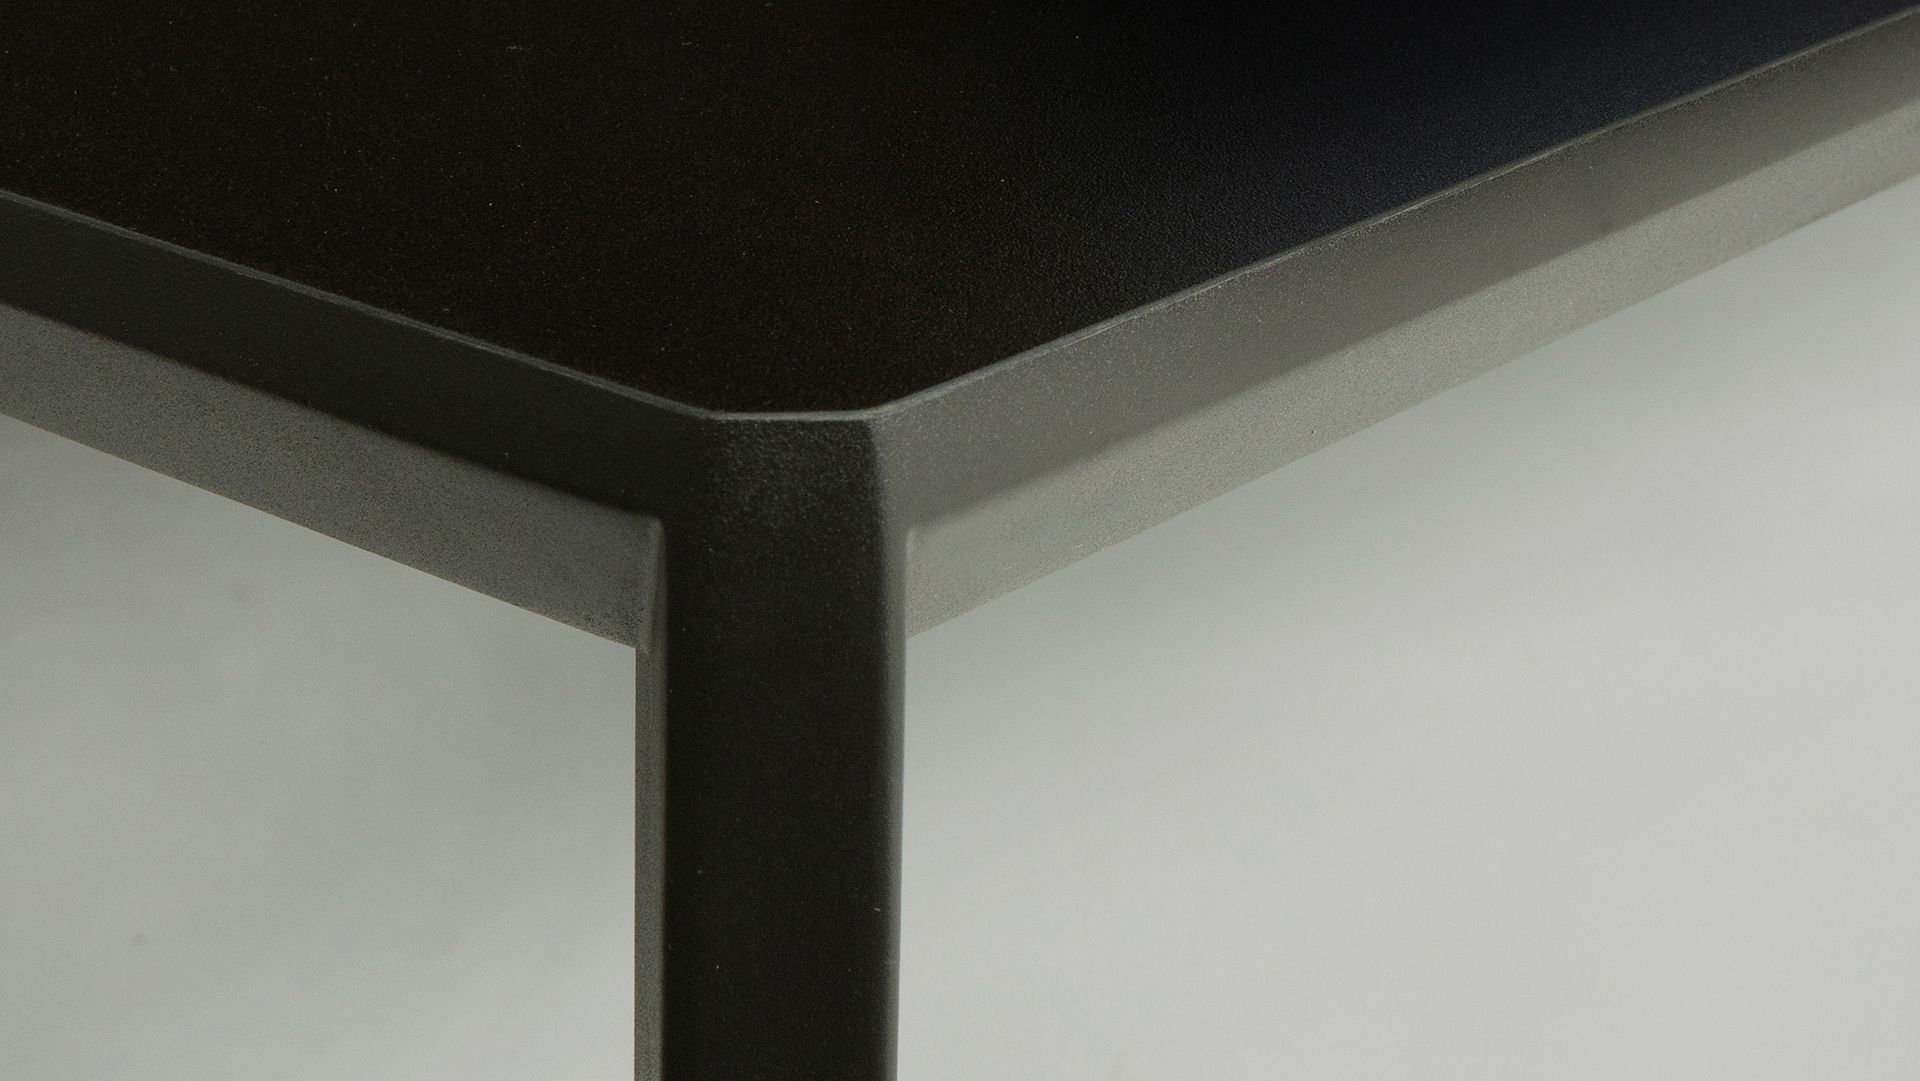 Metaform bt bijzettafel jan luppes interieurs melles interieur